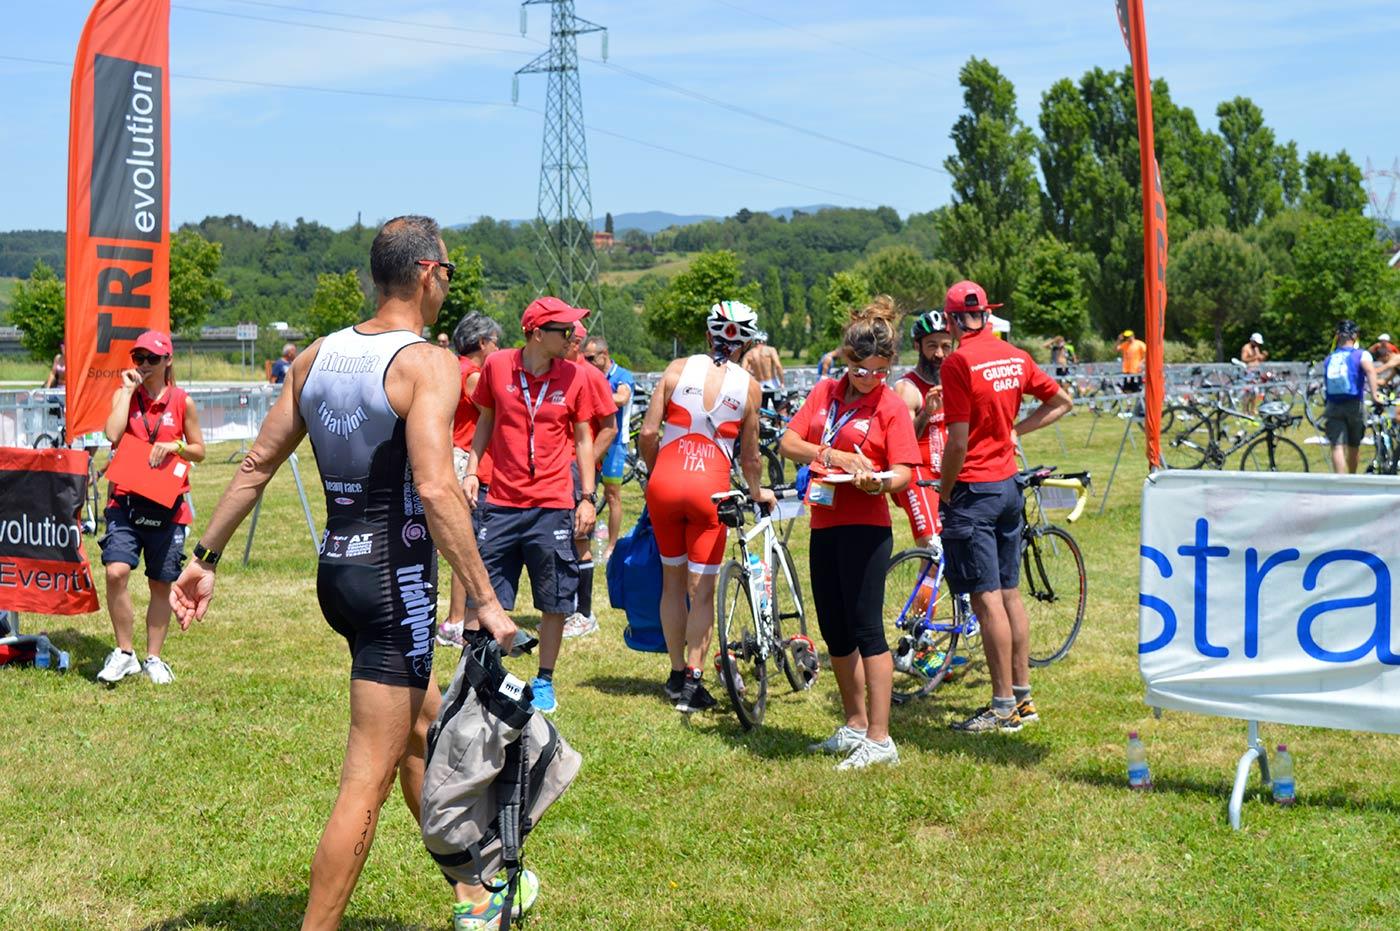 triathlon-olimpico-lago-di-bilancino-2016-4